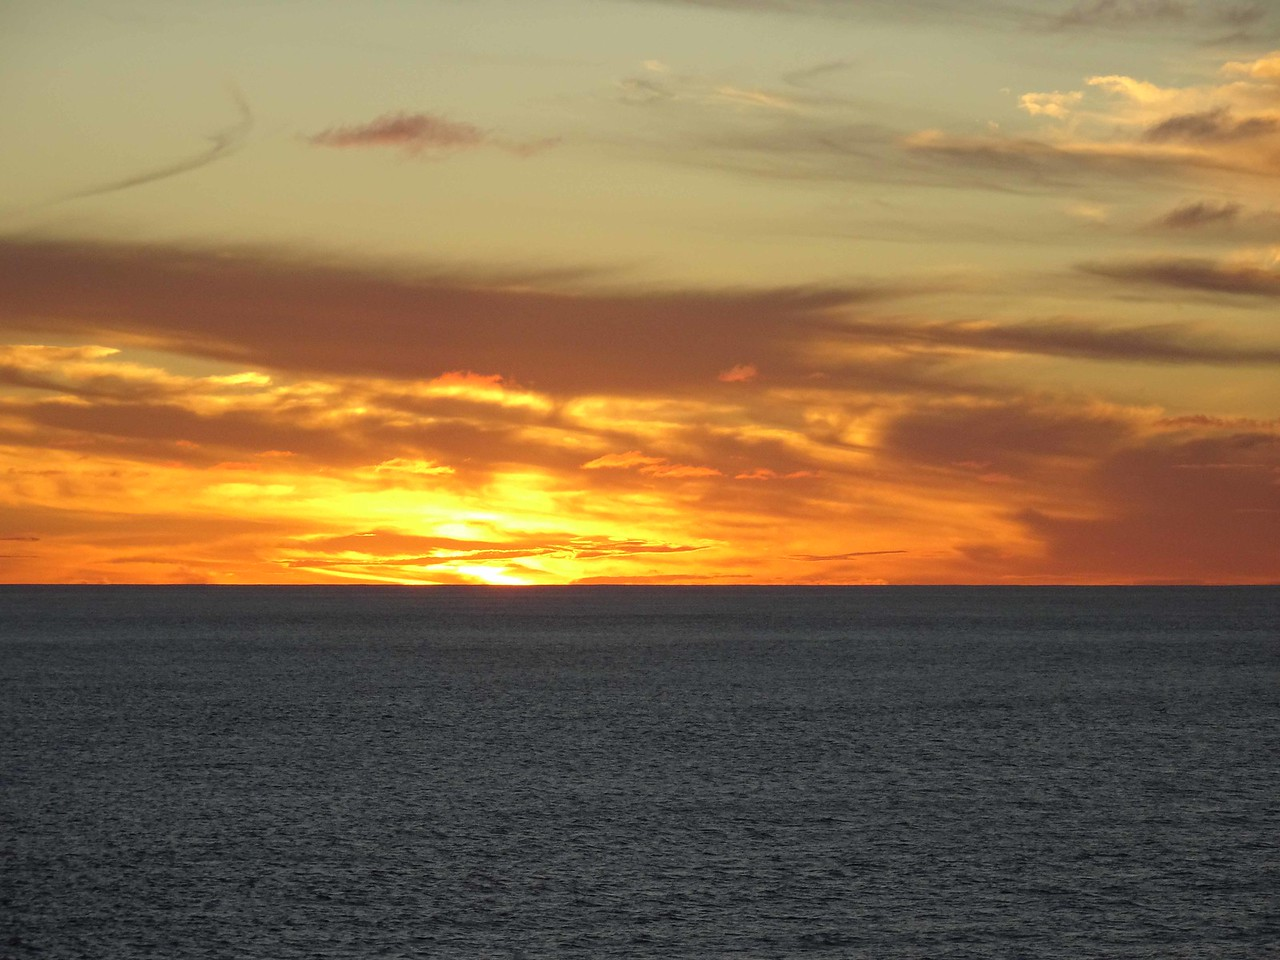 792 Sunset over the Tasmin Sea, April 11